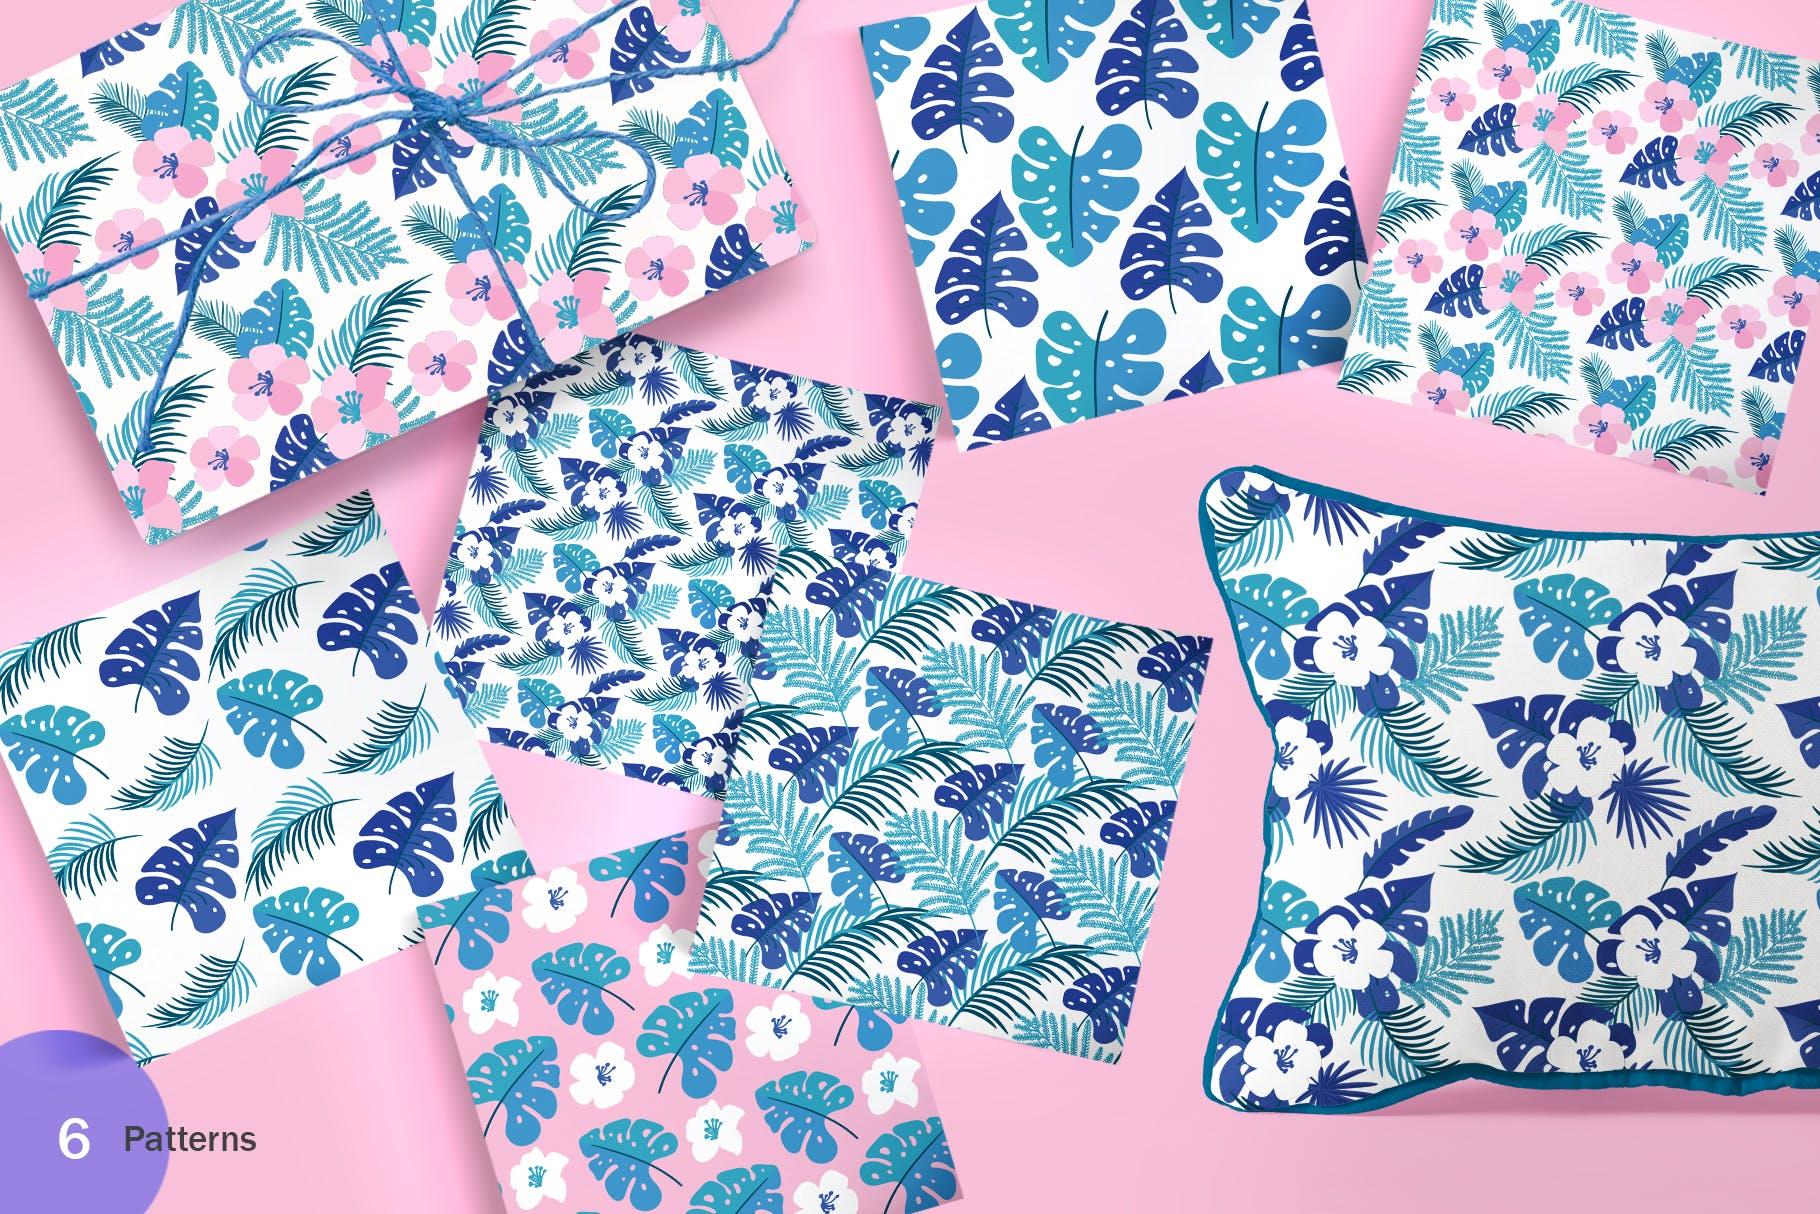 6个夏季无缝矢量图案素材图案纹理Summer Exotic Palm Design Elements SVG插图(3)